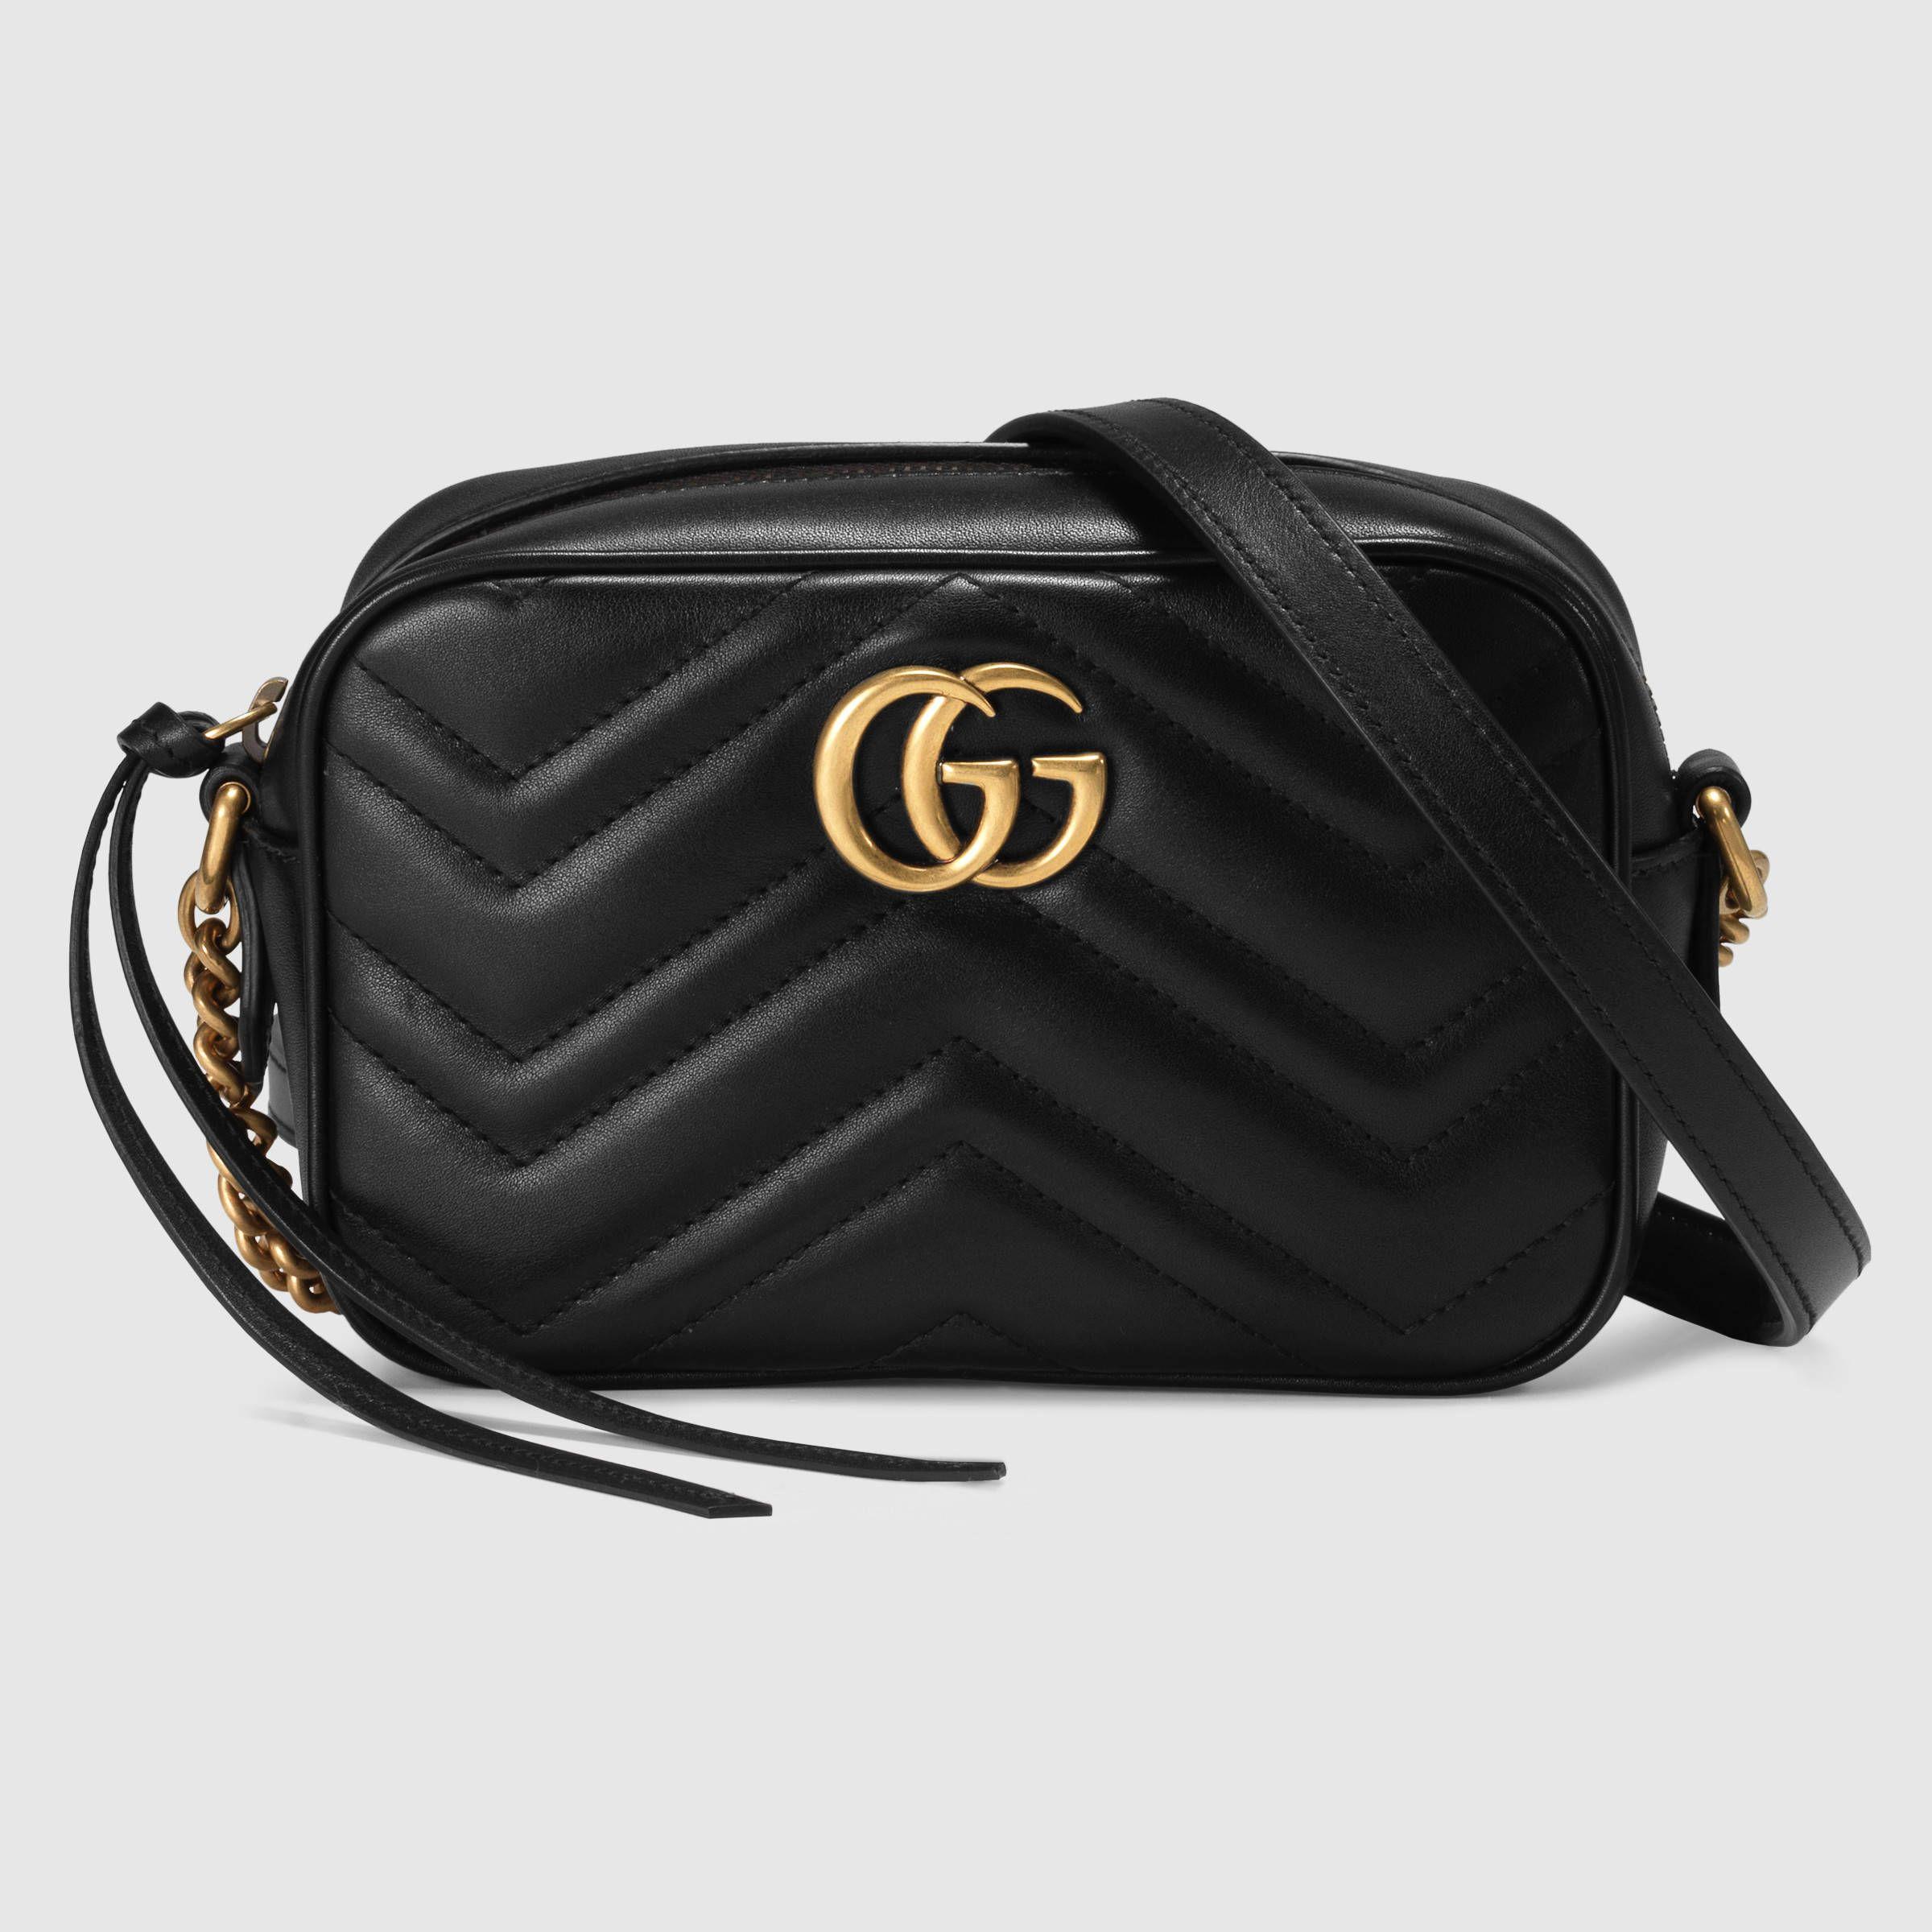 7c74abff8e69 Gg Marmont Matelassé Mini Bag Youtube | Stanford Center for ...